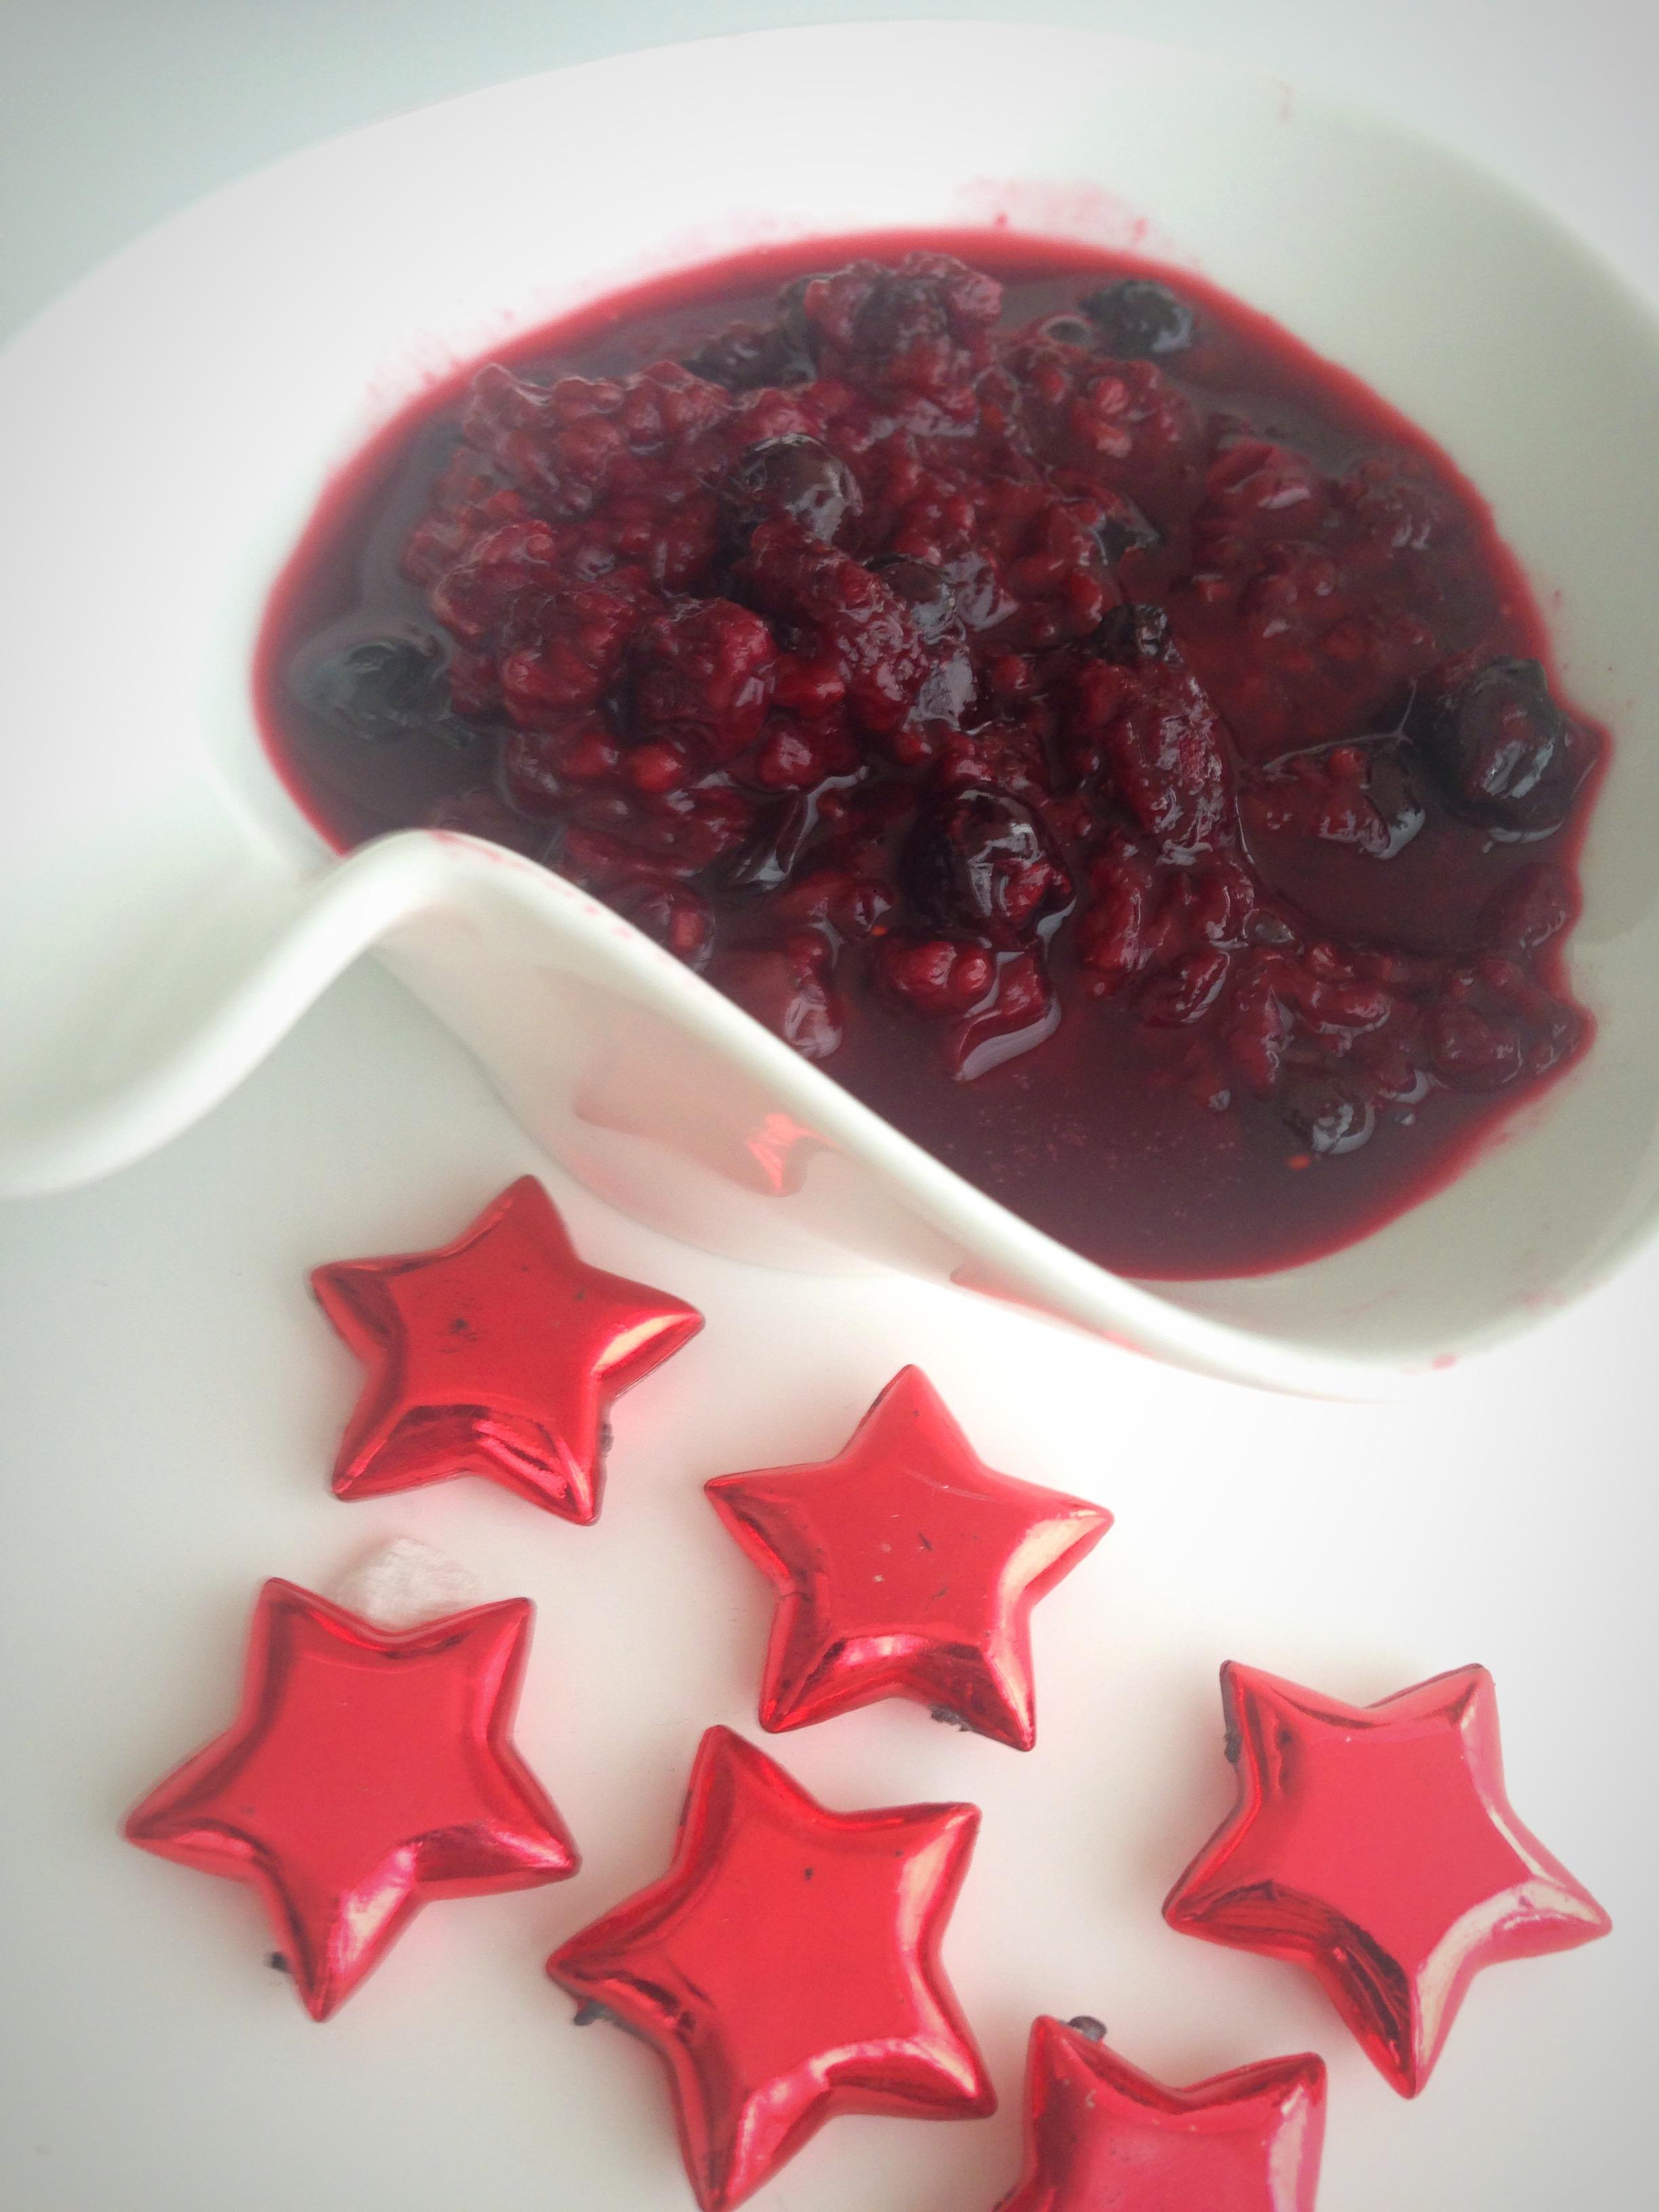 Kilos mermelada de frutos rojos